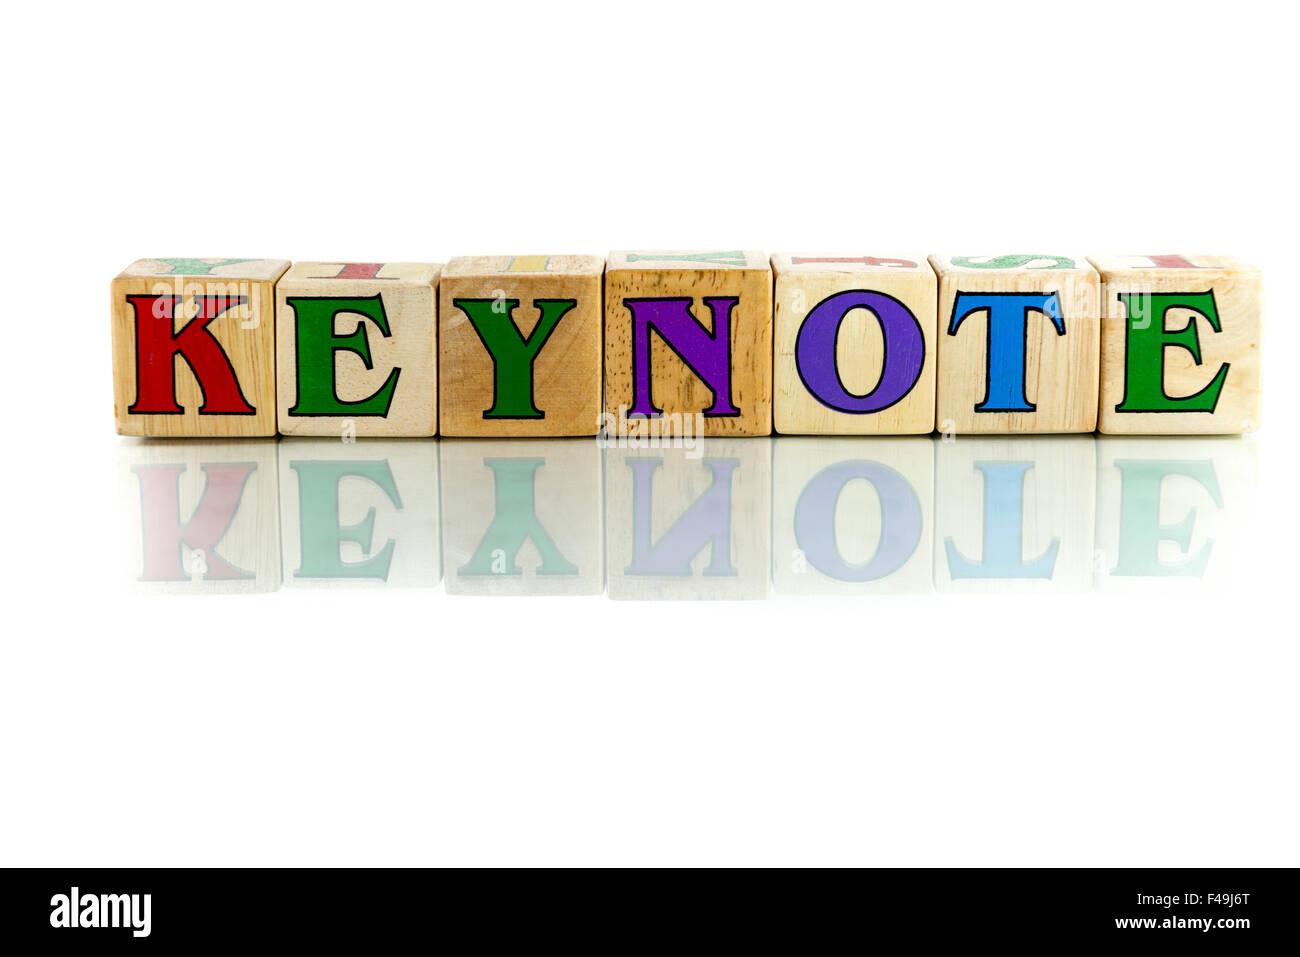 keynote - Stock Image